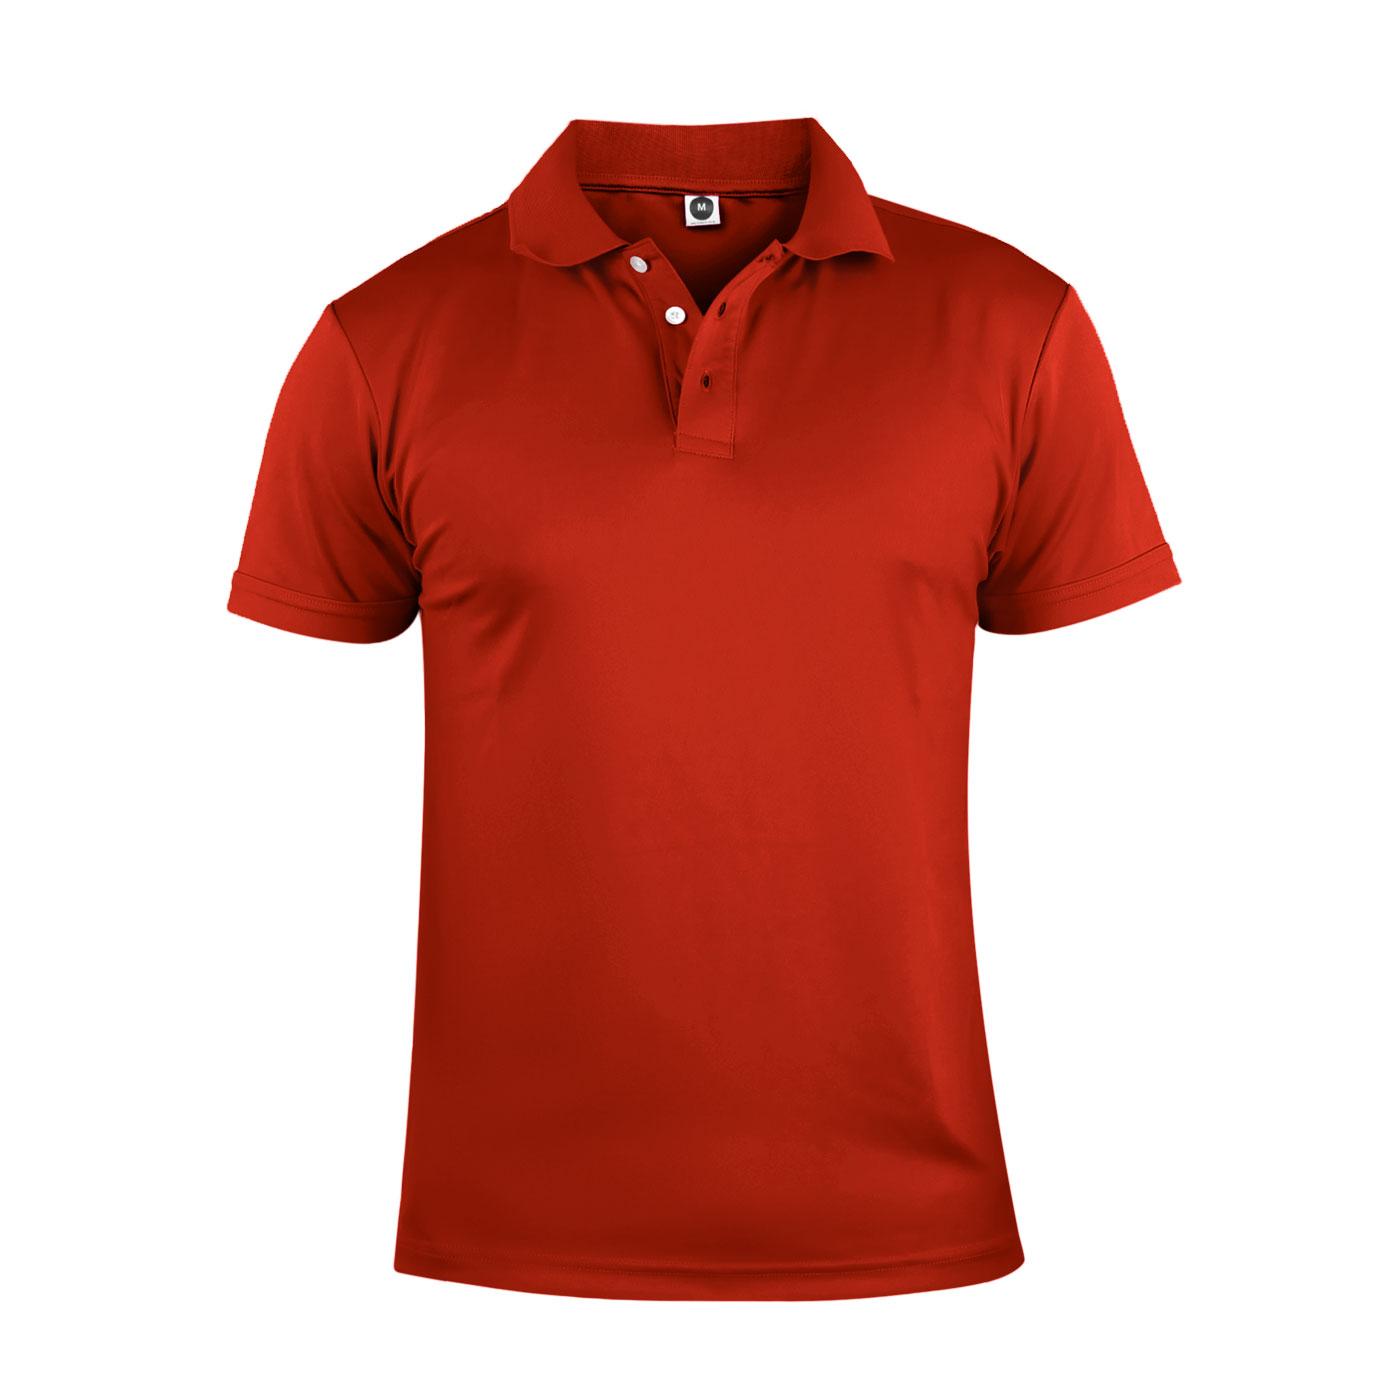 HODARLA 彈力涼感短袖POLO衫 3113901 - 紅